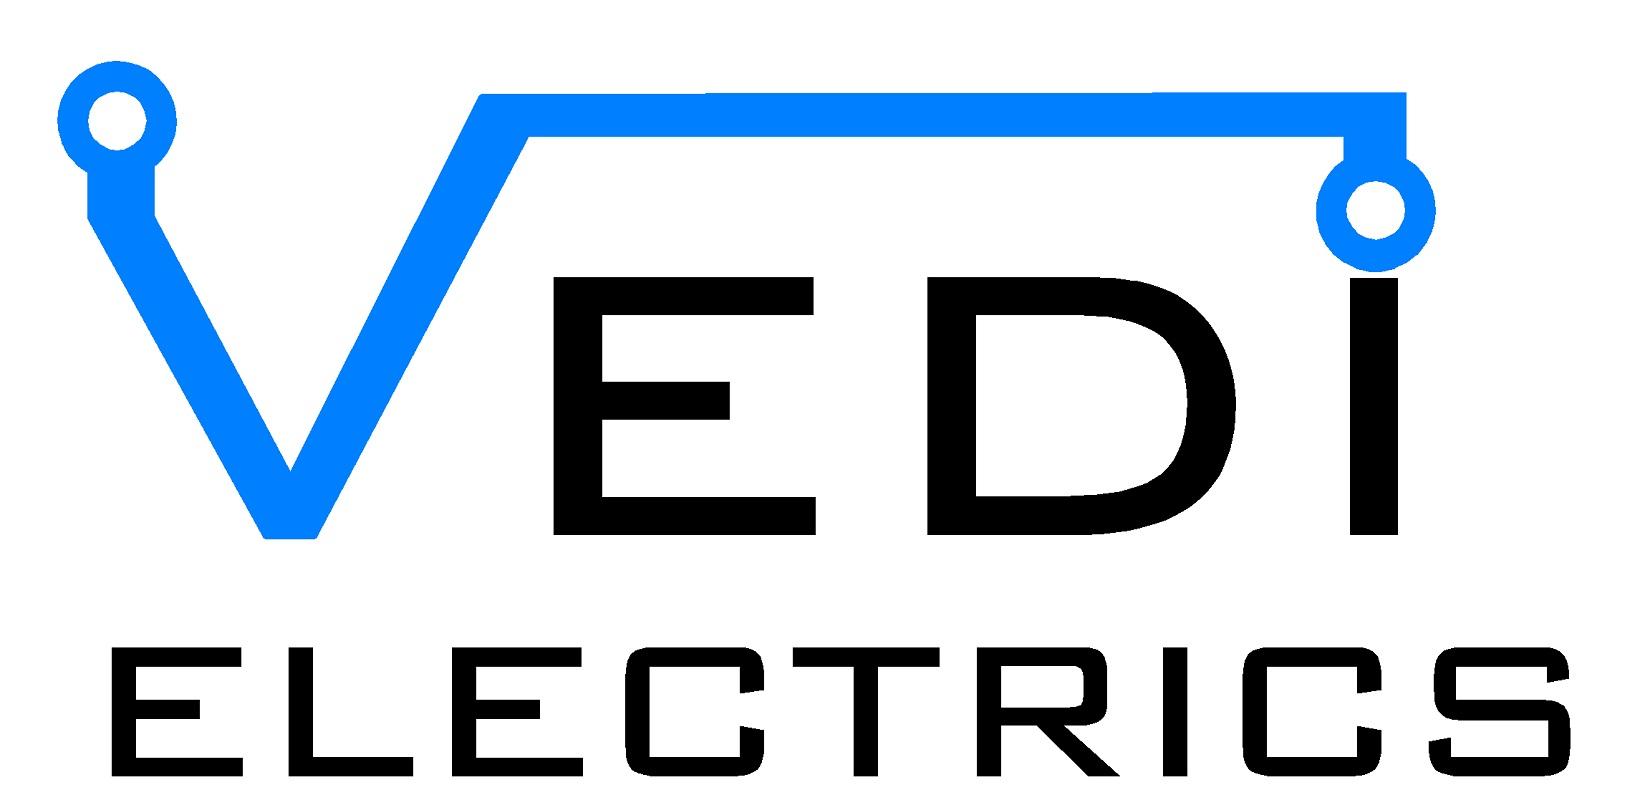 Vedi Electrics